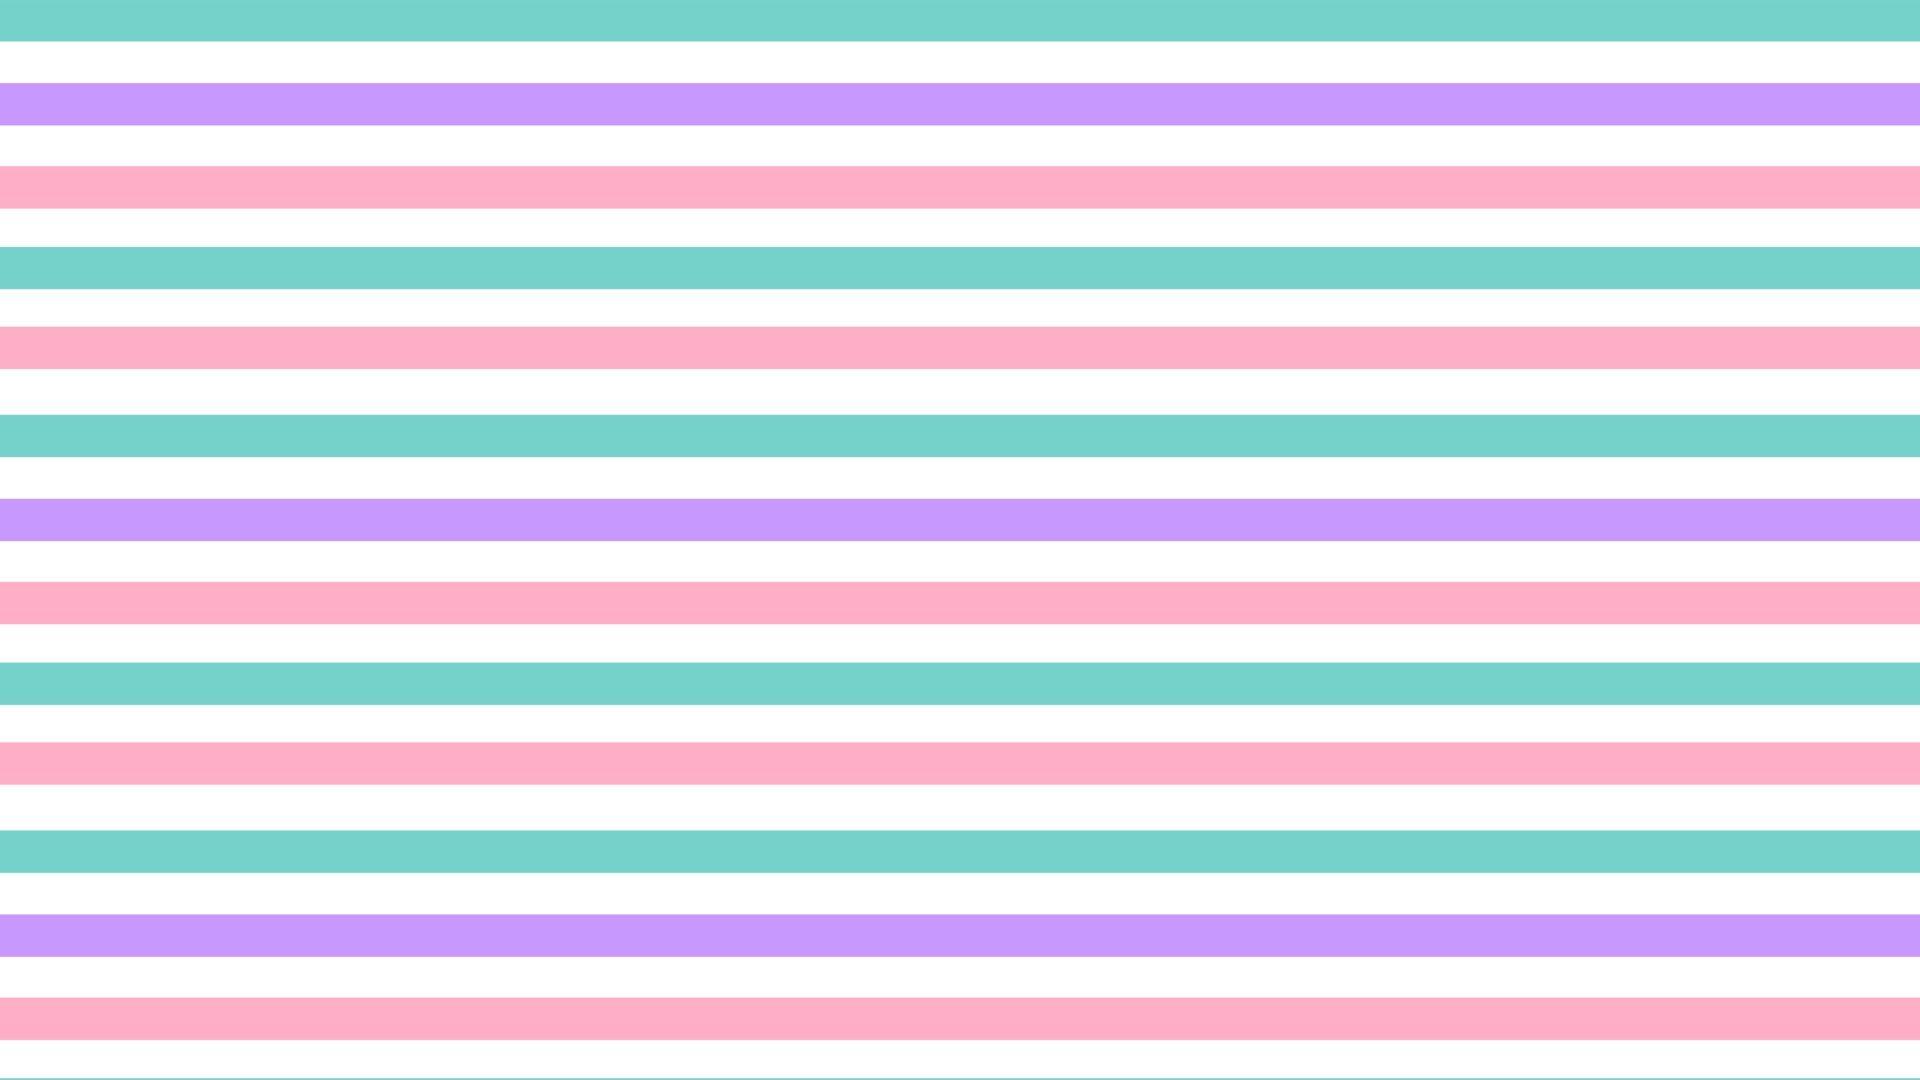 horizontal striped wallpaper b&q,pink